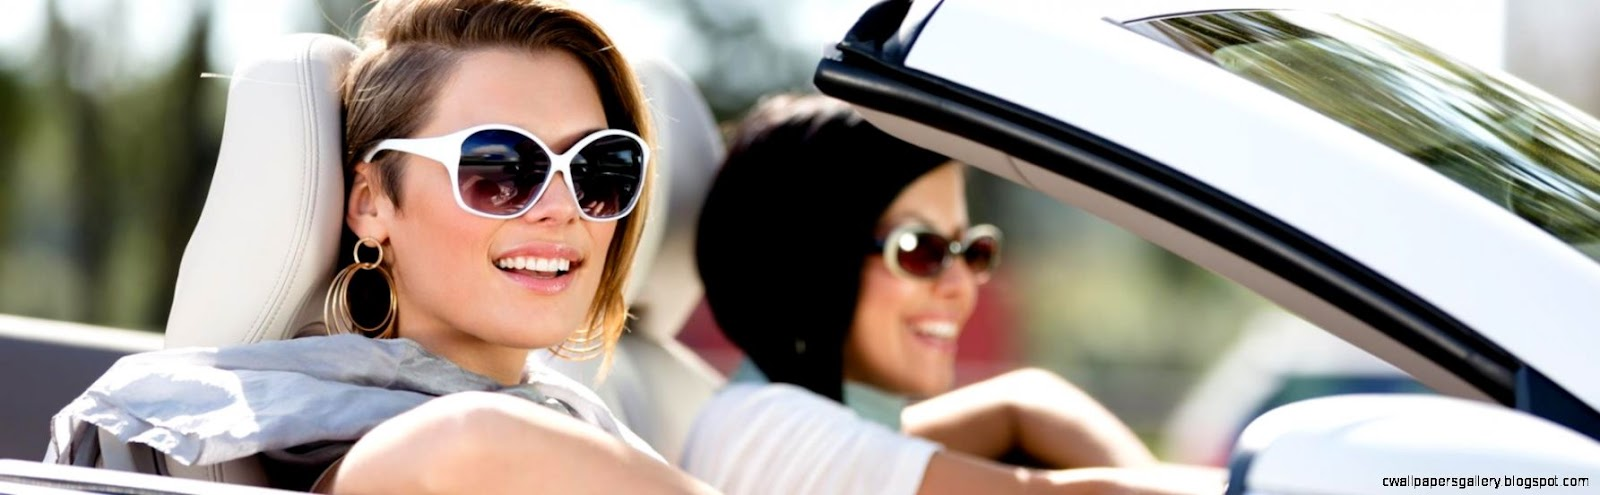 Exotic Supercar Hire  Prestige Luxury Car Rental in Marbella